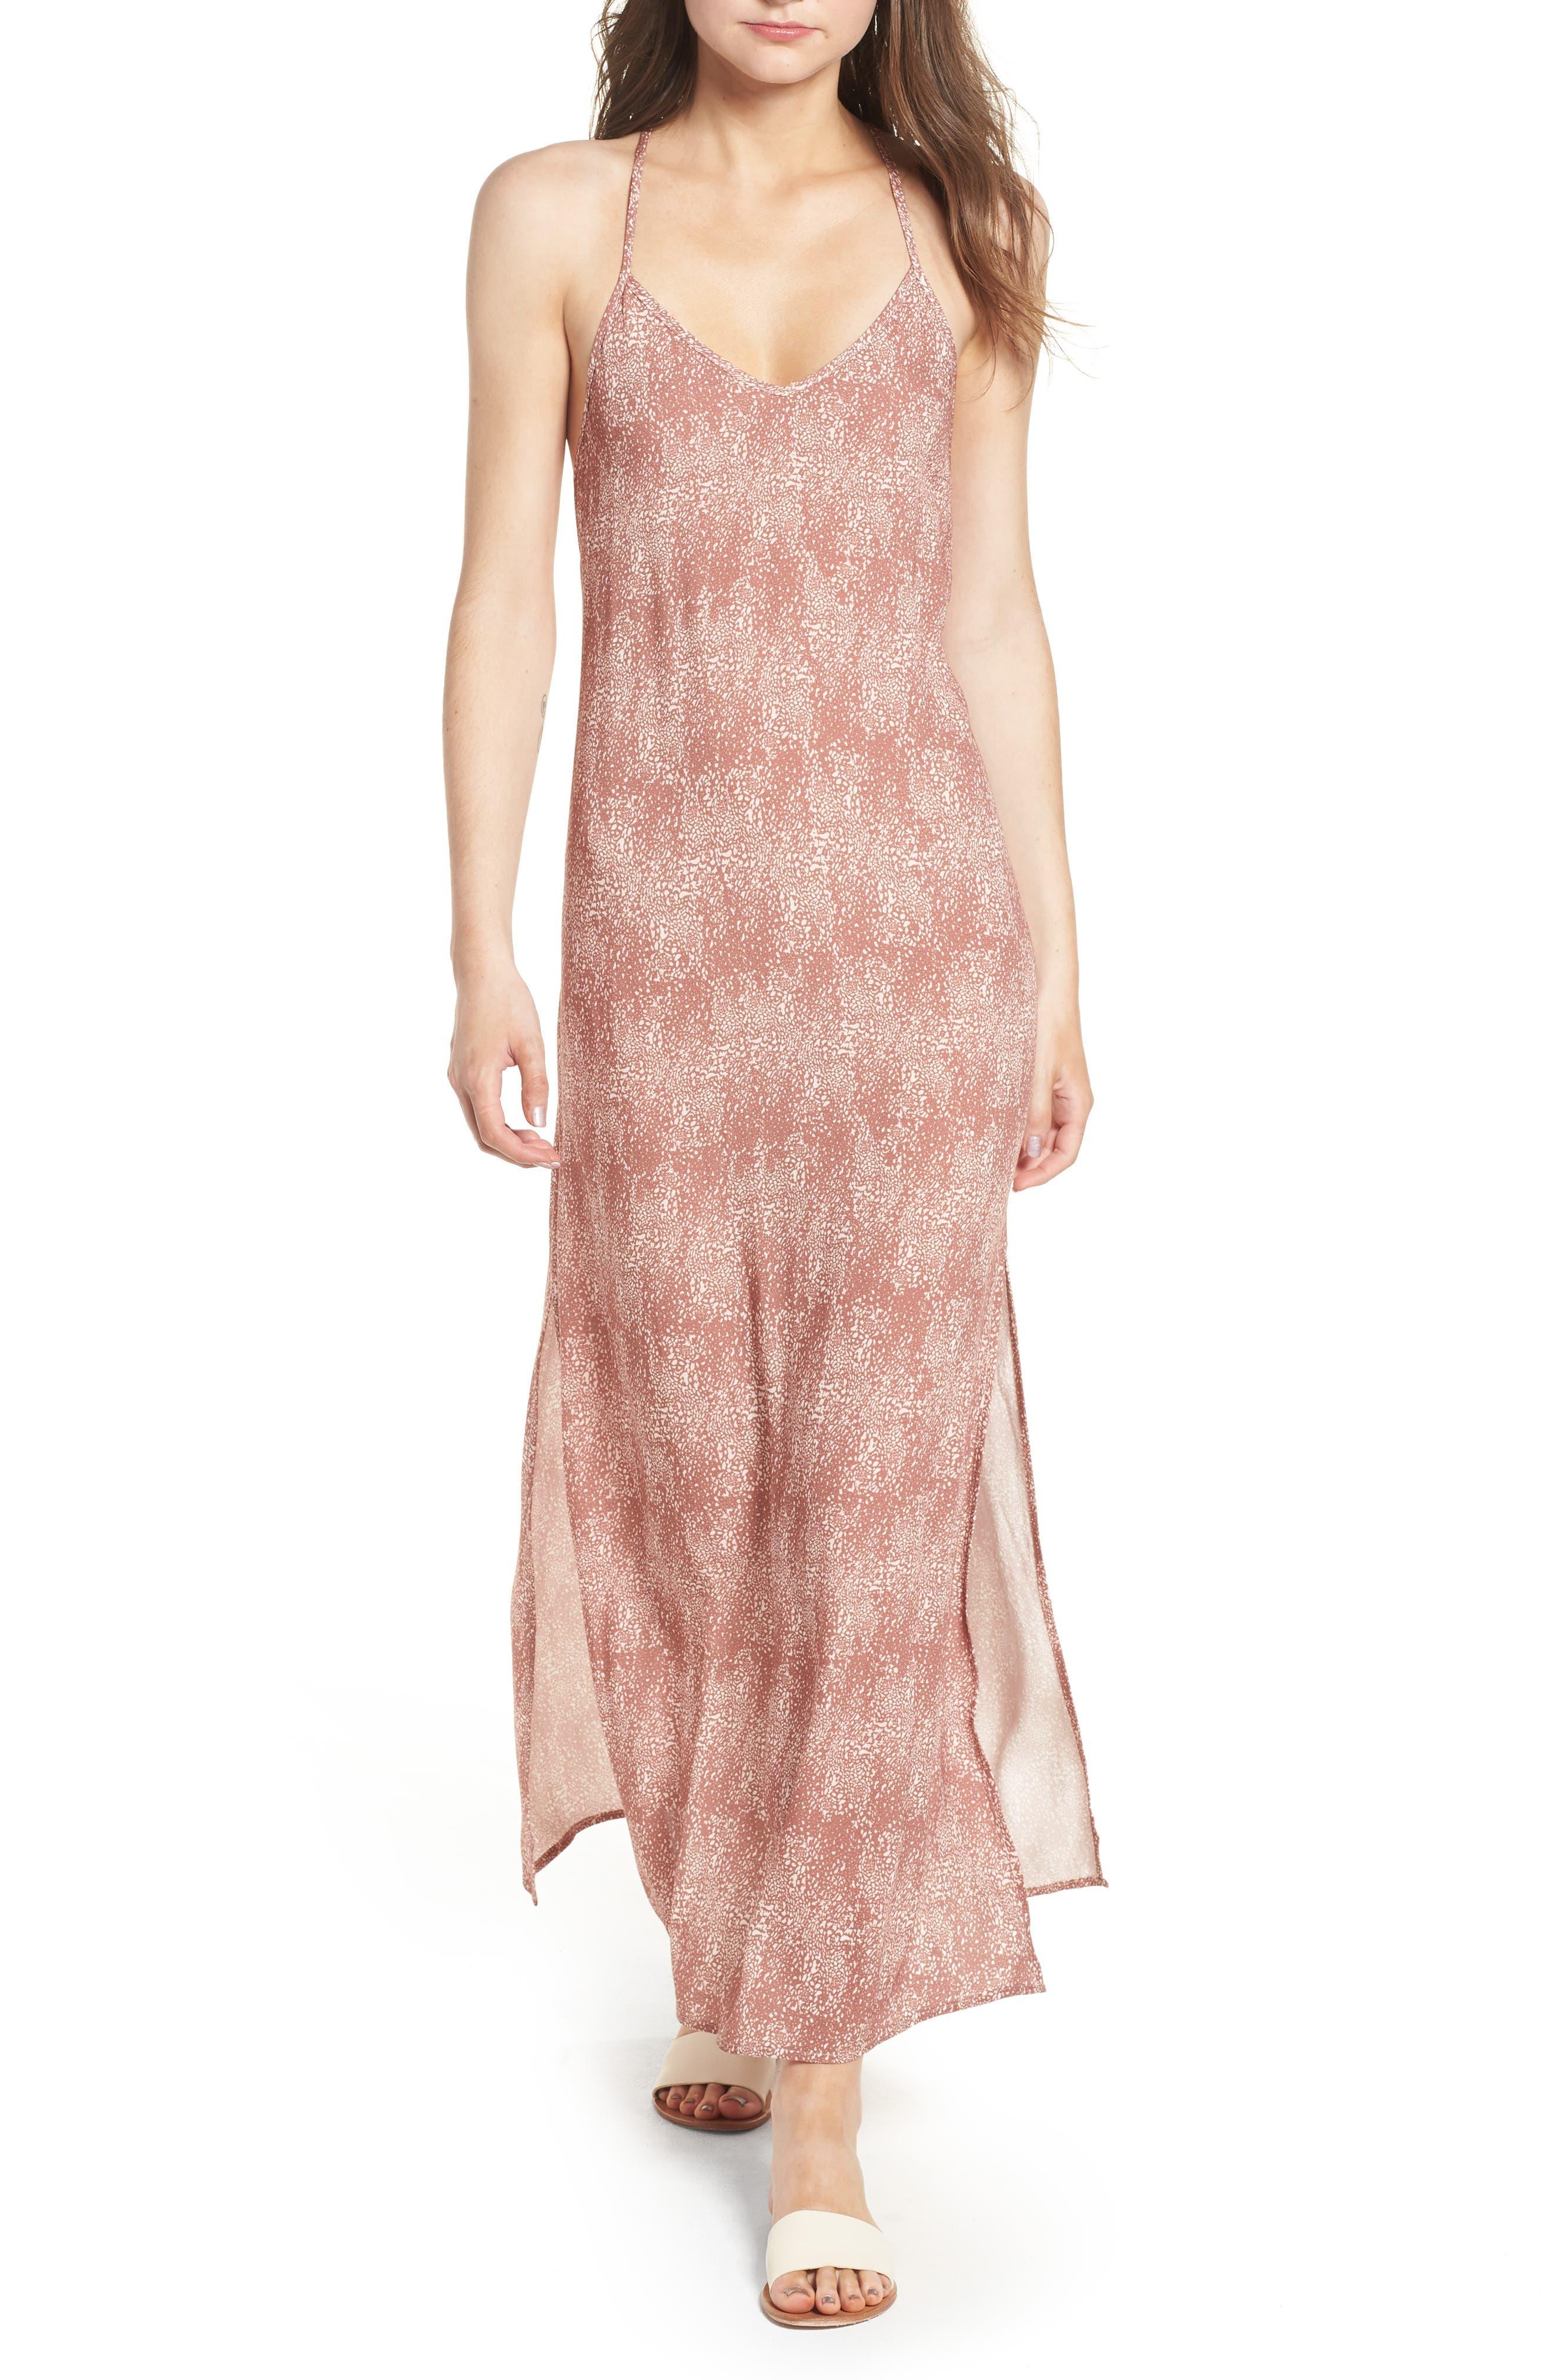 Lira Clothing Misty Morning Maxi Dress